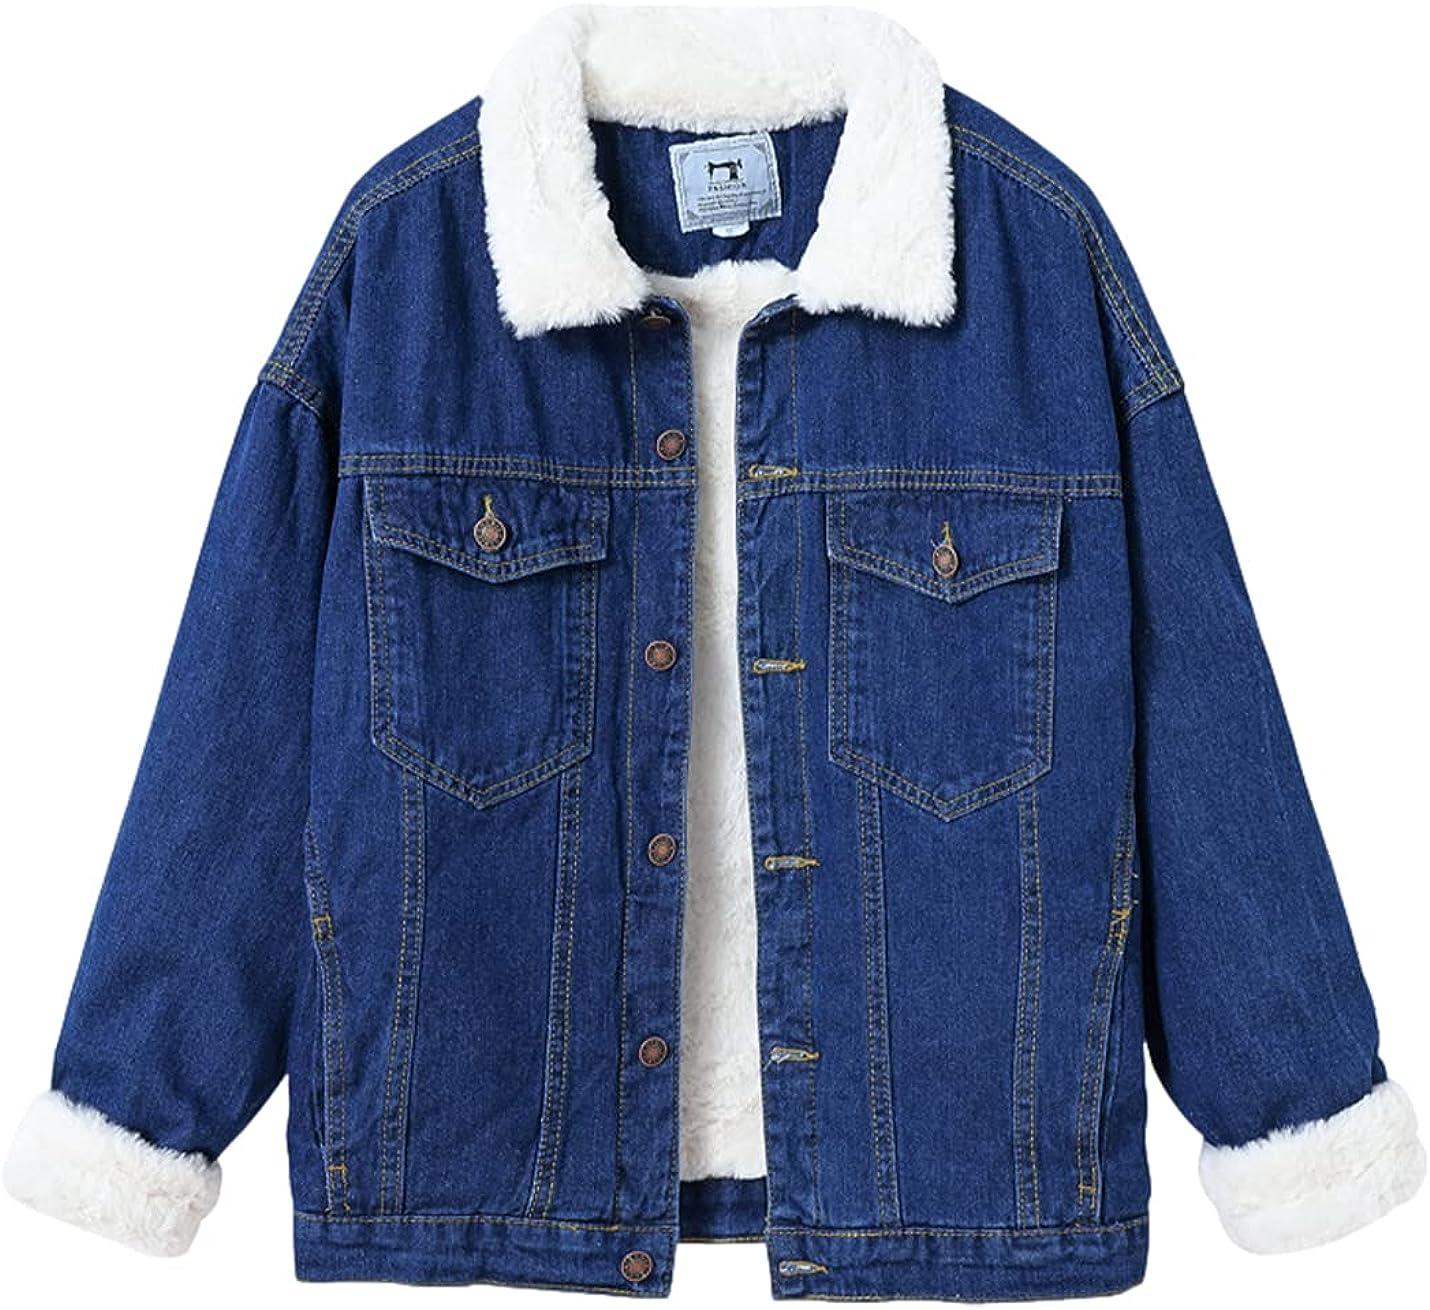 Xishiloft Women's Fleece Denim Jacket Lapel Long Sleeve Buttons Down Washed Retro Casual Rabbit Fur Denim Parka Coats